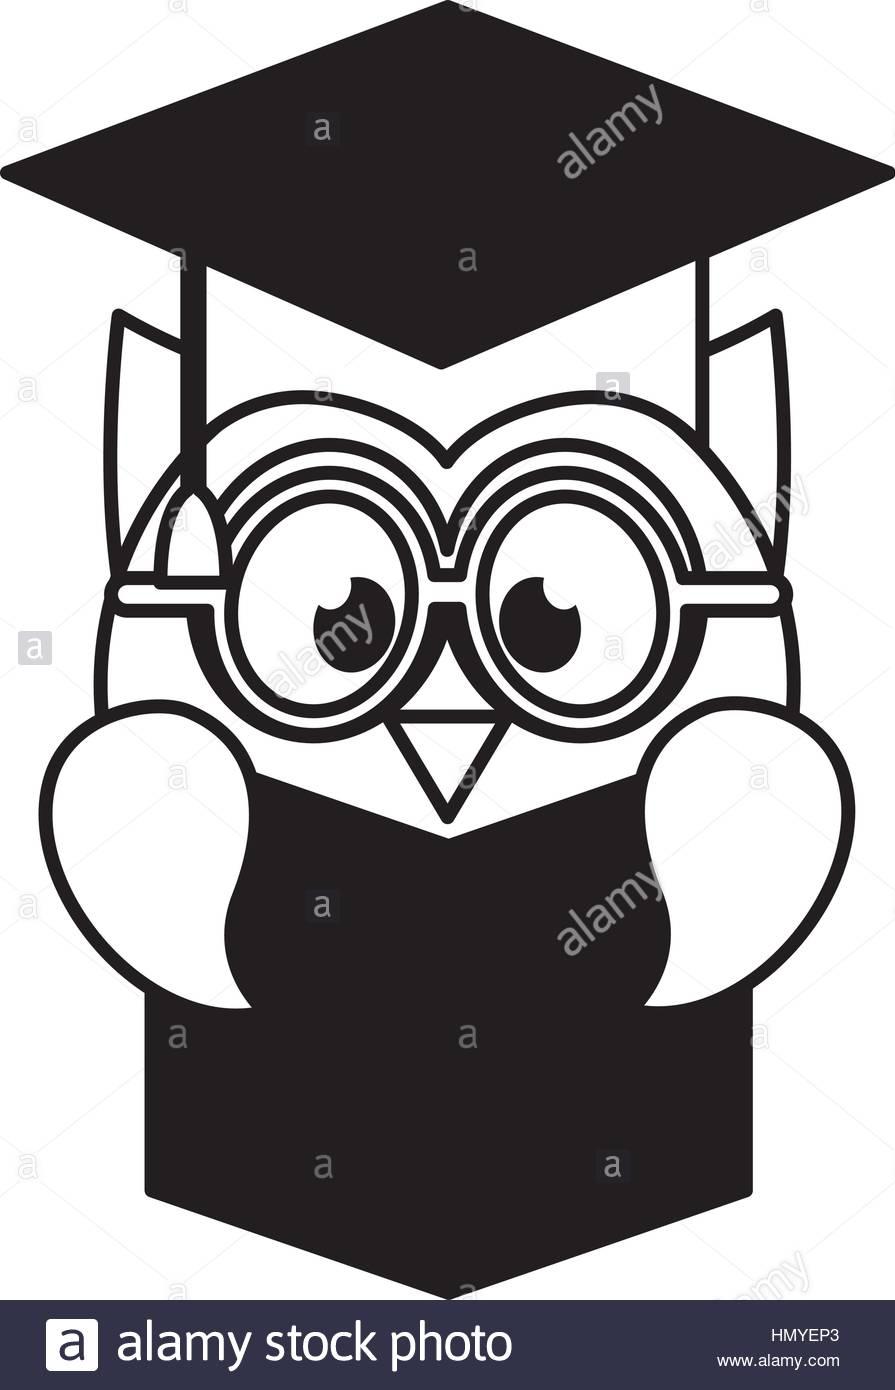 895x1390 Owl With Graduation Hat Vector Illustration Design Stock Vector